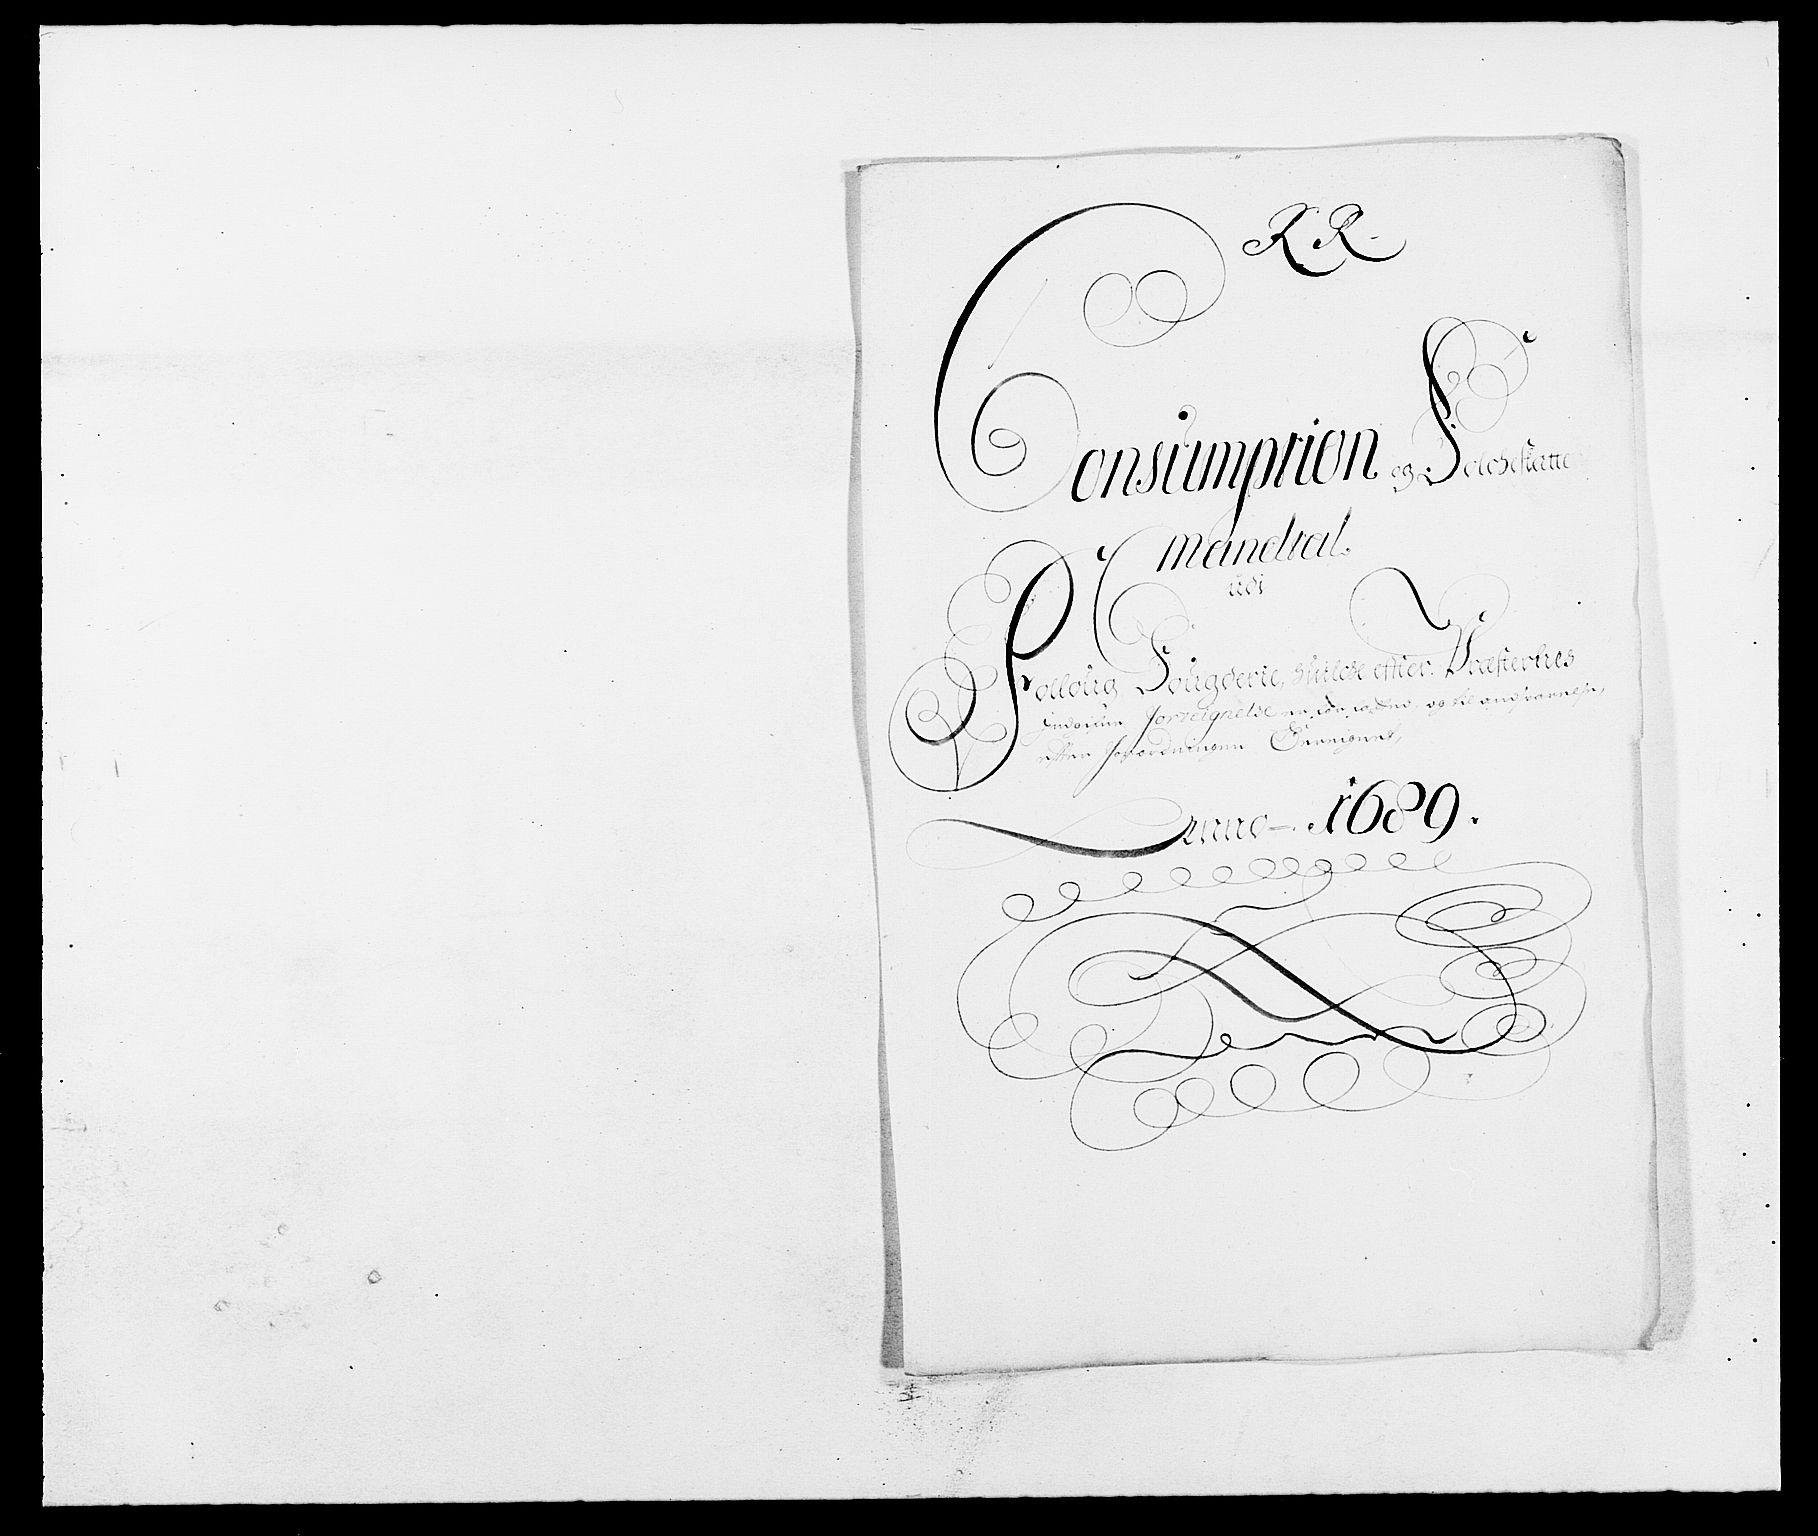 RA, Rentekammeret inntil 1814, Reviderte regnskaper, Fogderegnskap, R09/L0435: Fogderegnskap Follo, 1689-1691, s. 173